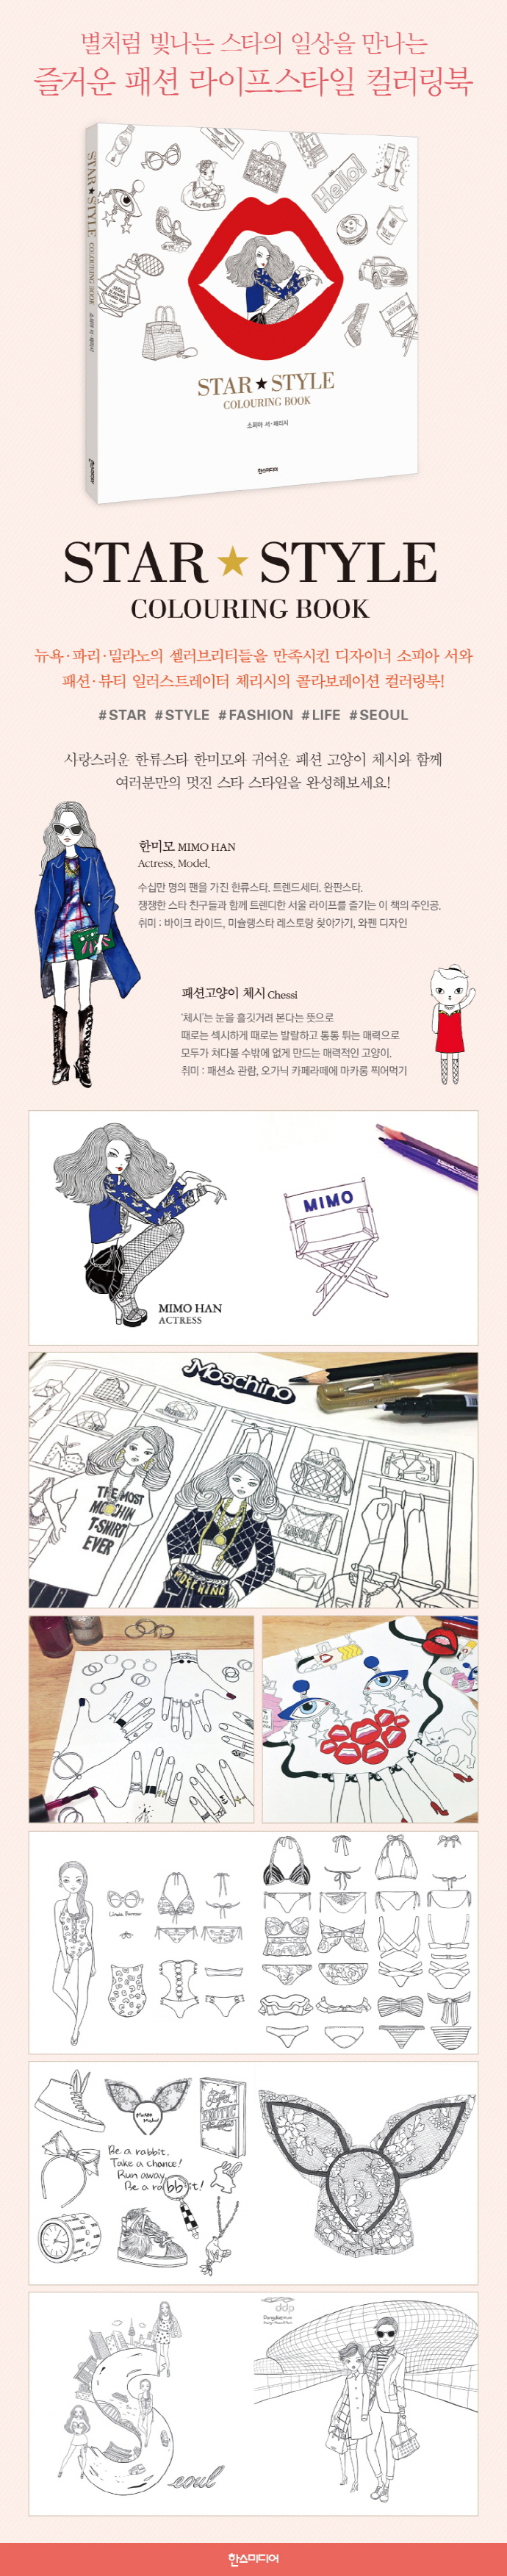 Star Style Colouring Book(스타 스타일 컬러링북) 도서 상세이미지